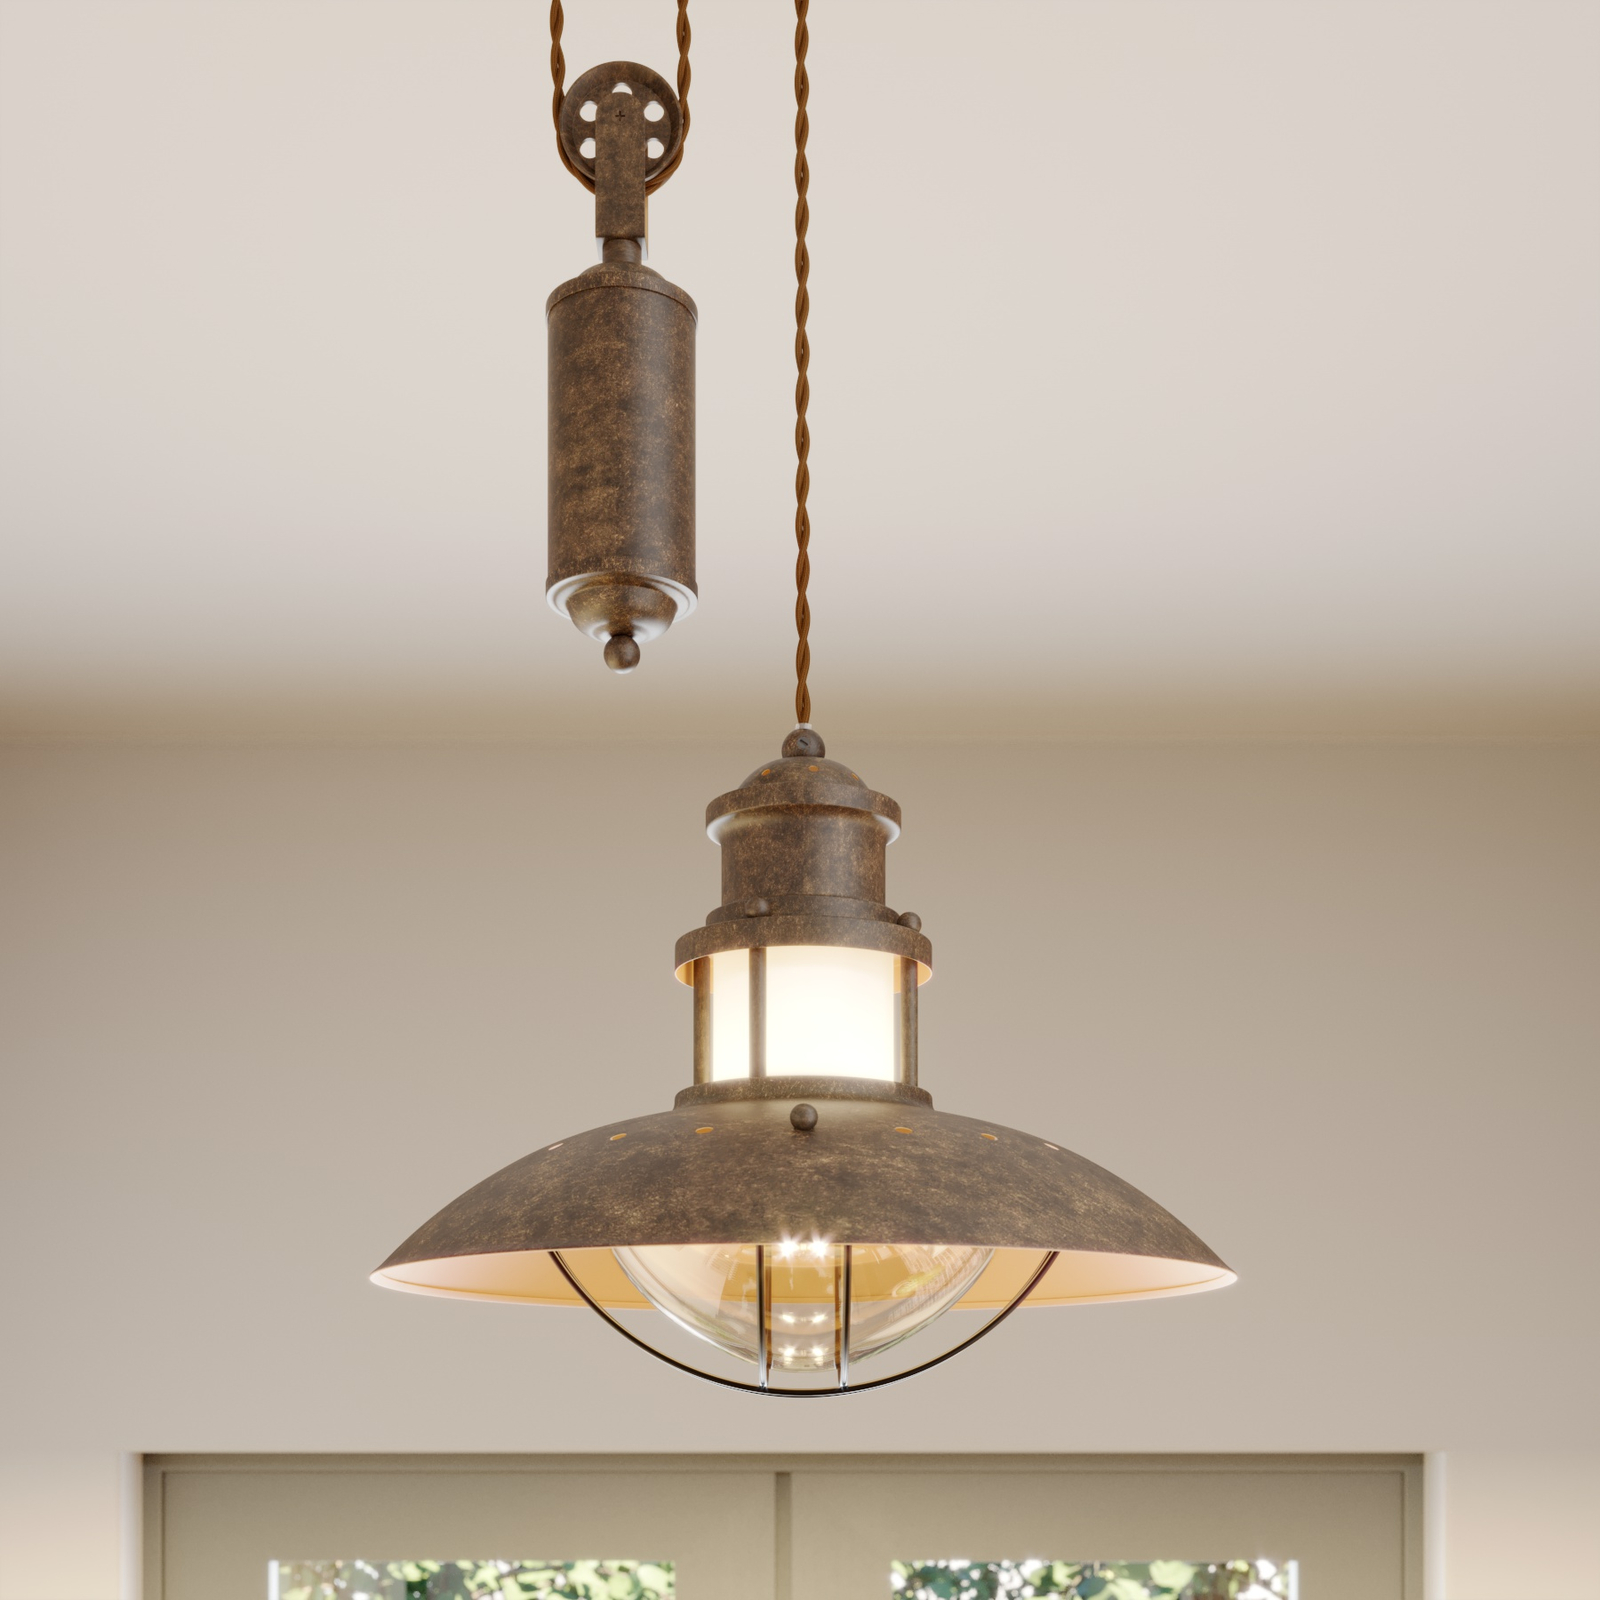 Louisanne højdejusterbar kabel-hængelampe